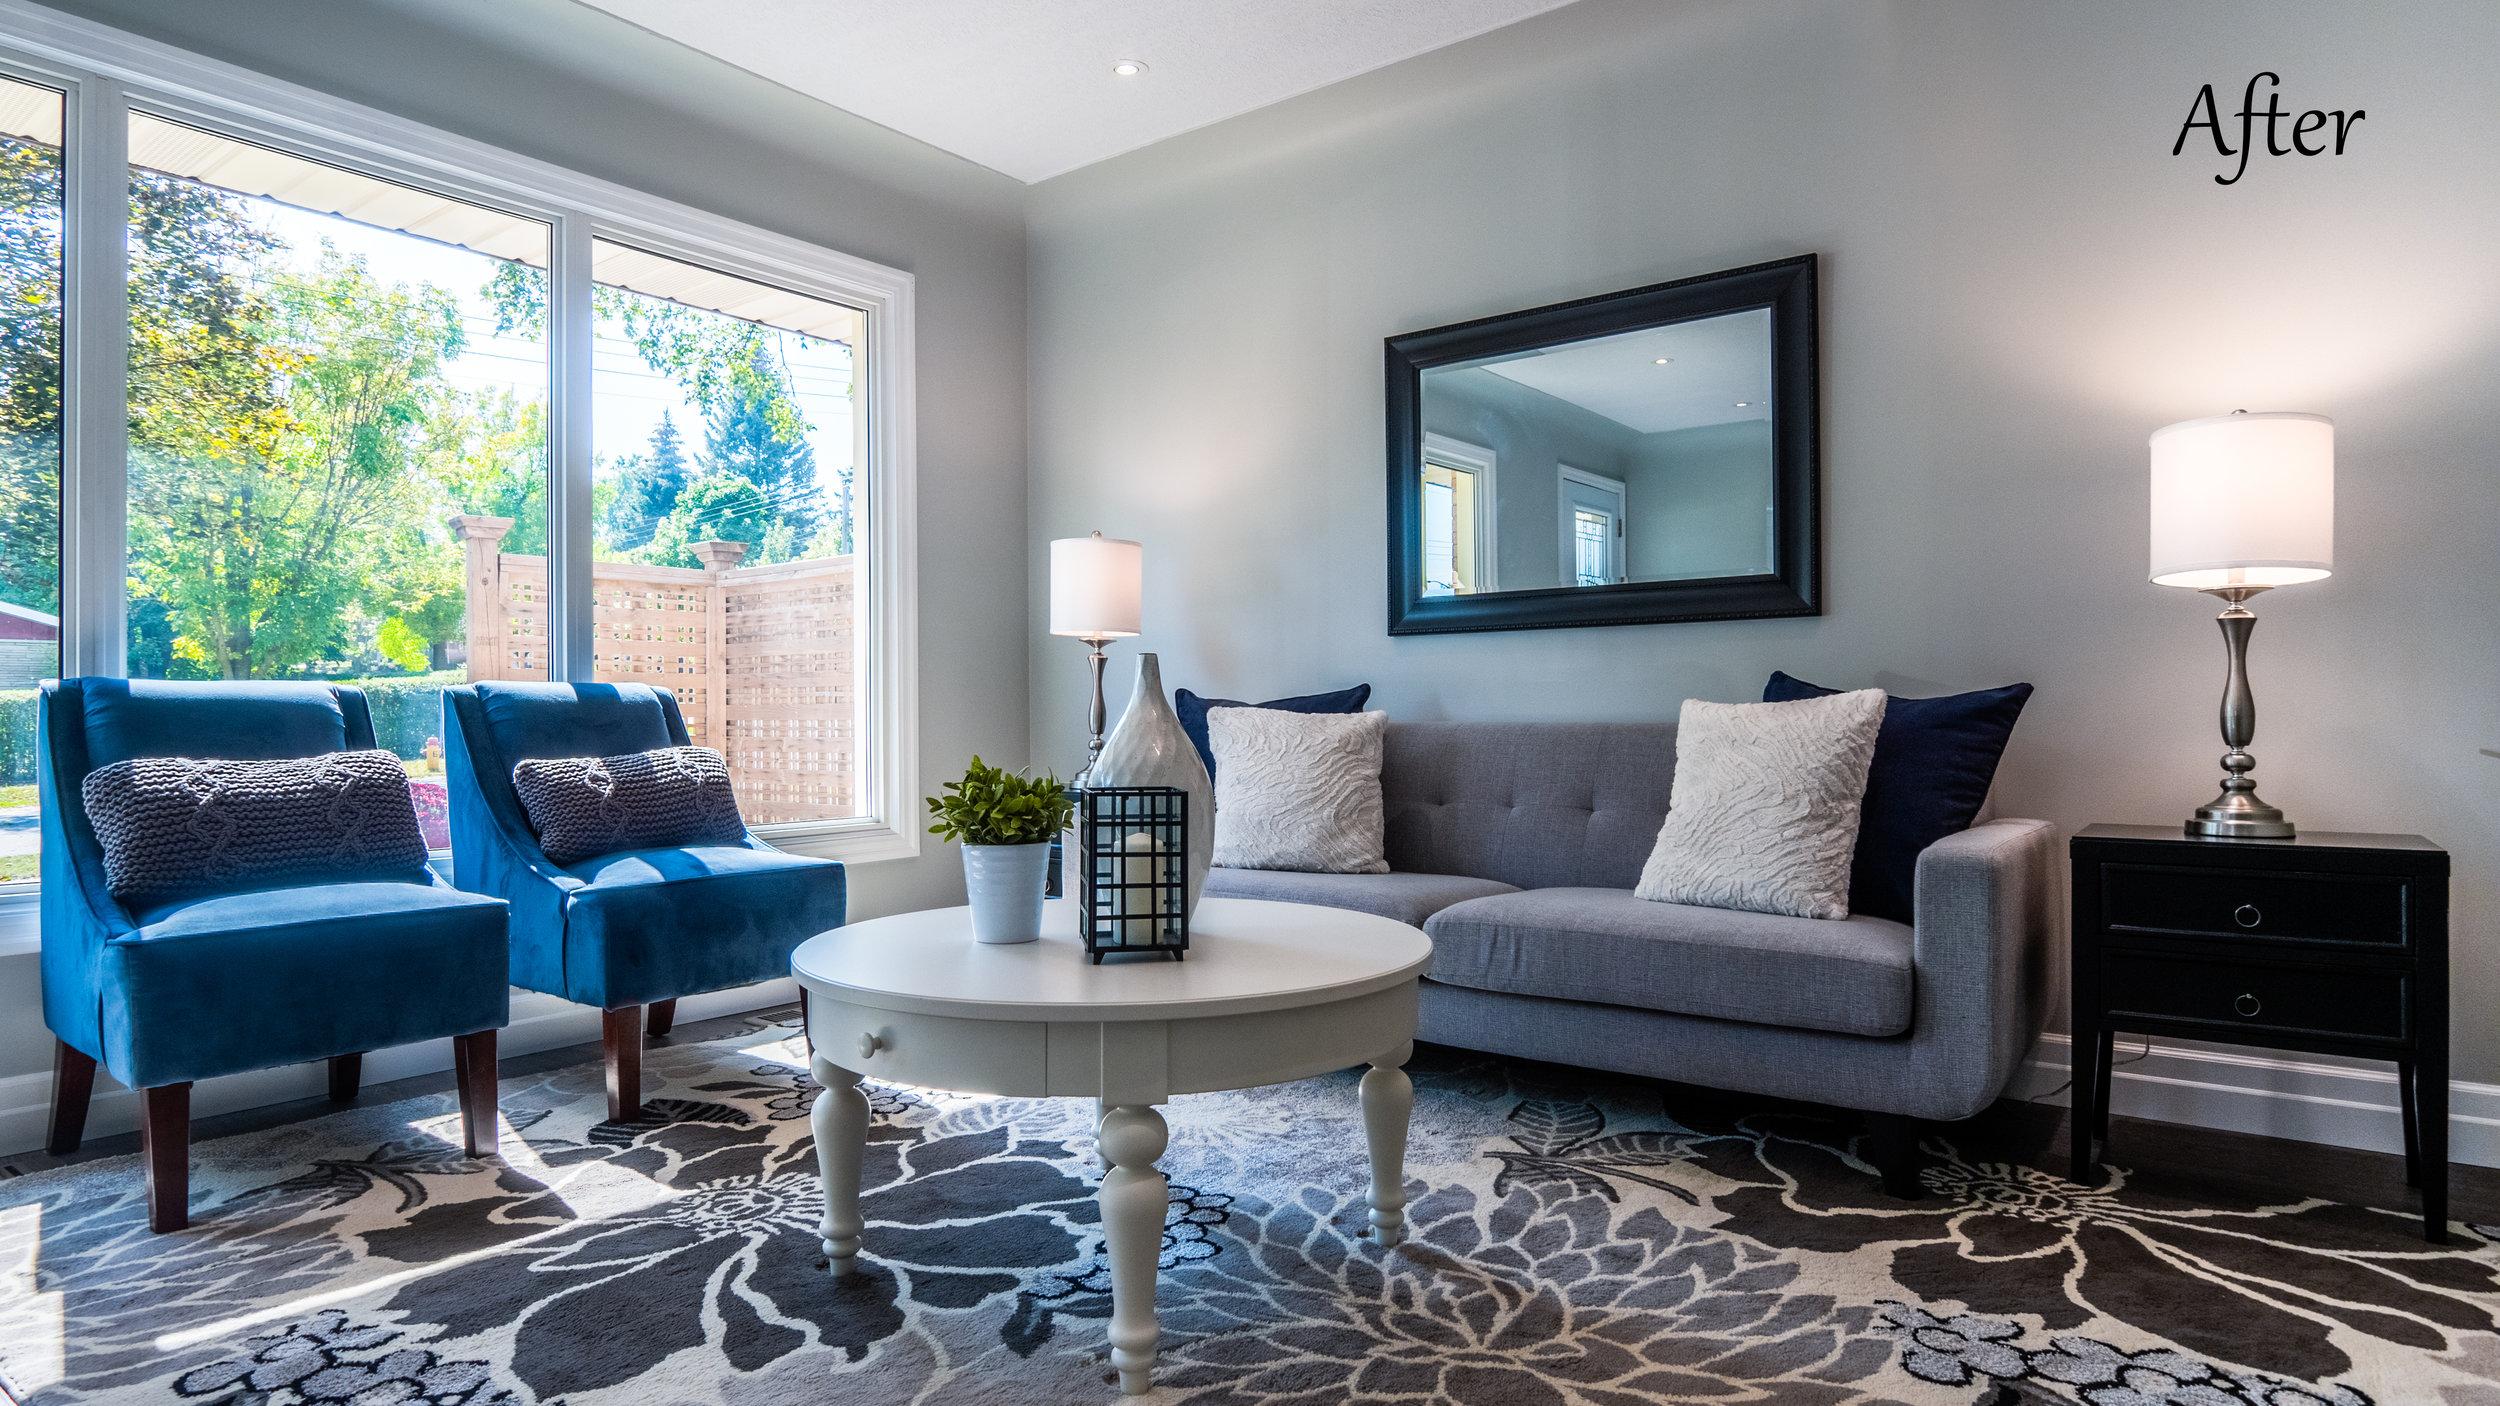 Livingroom 1 - After 2.jpg